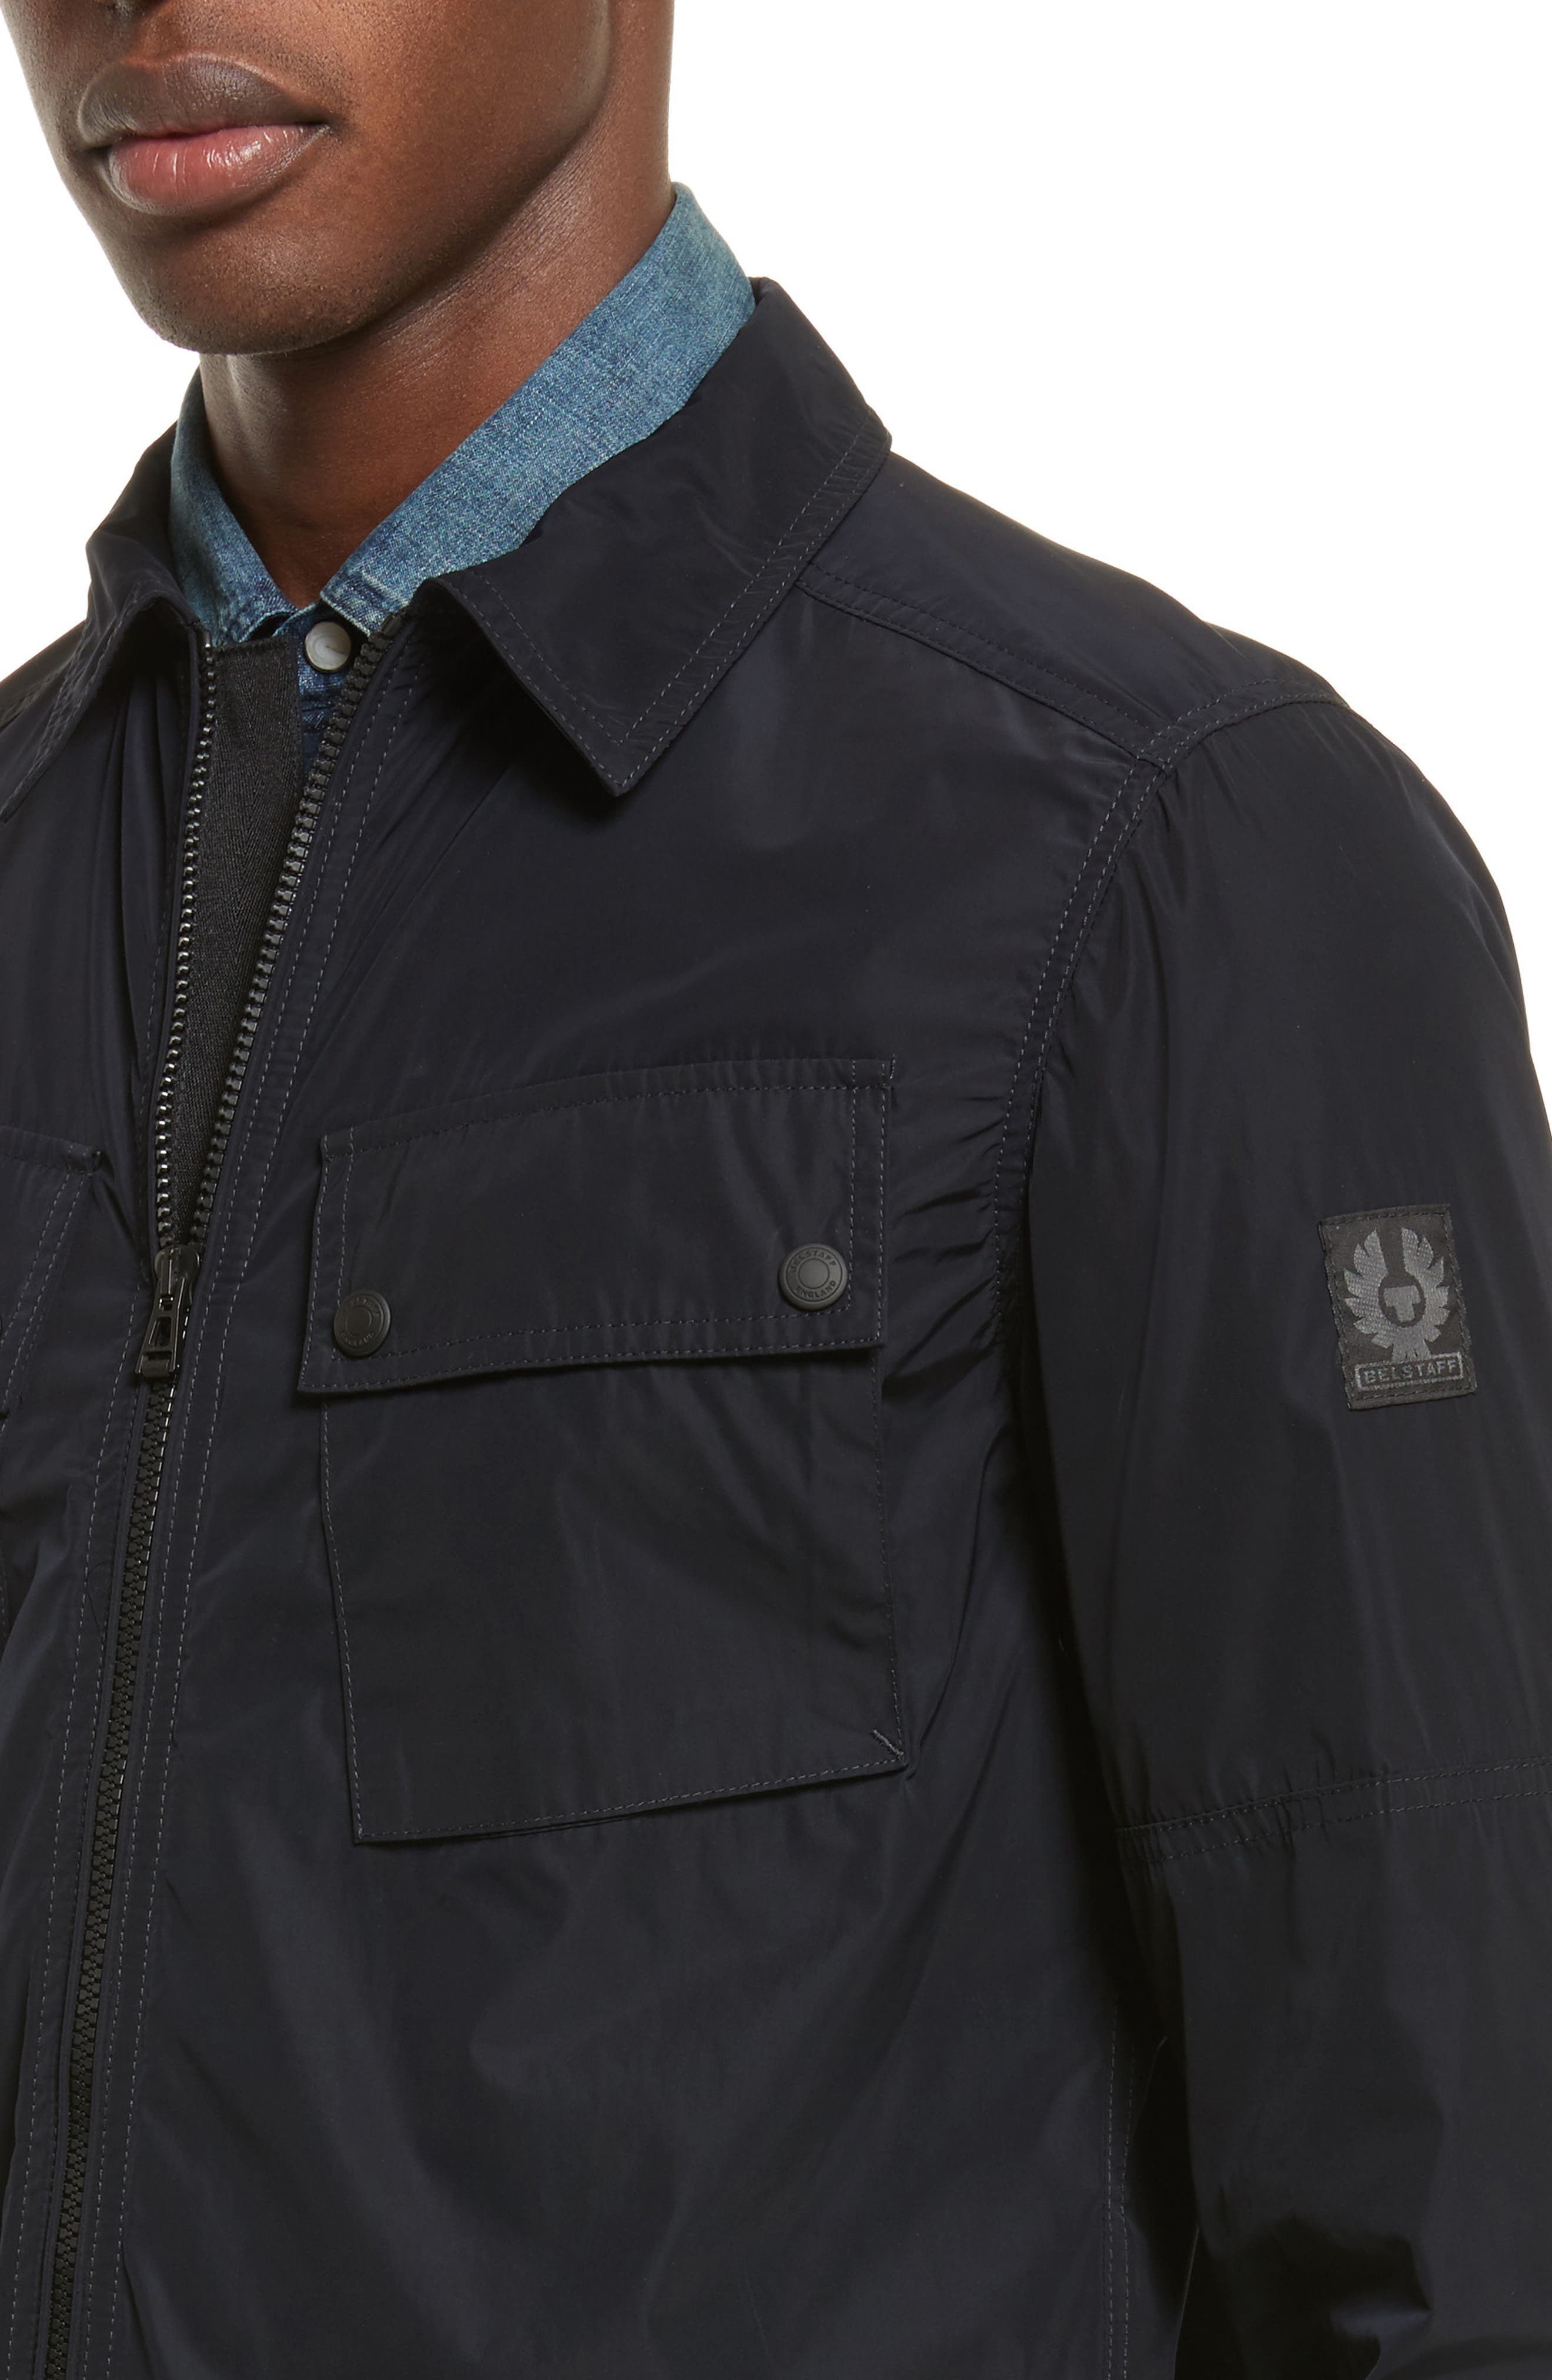 Talbrook Shirt Jacket,                             Alternate thumbnail 4, color,                             402